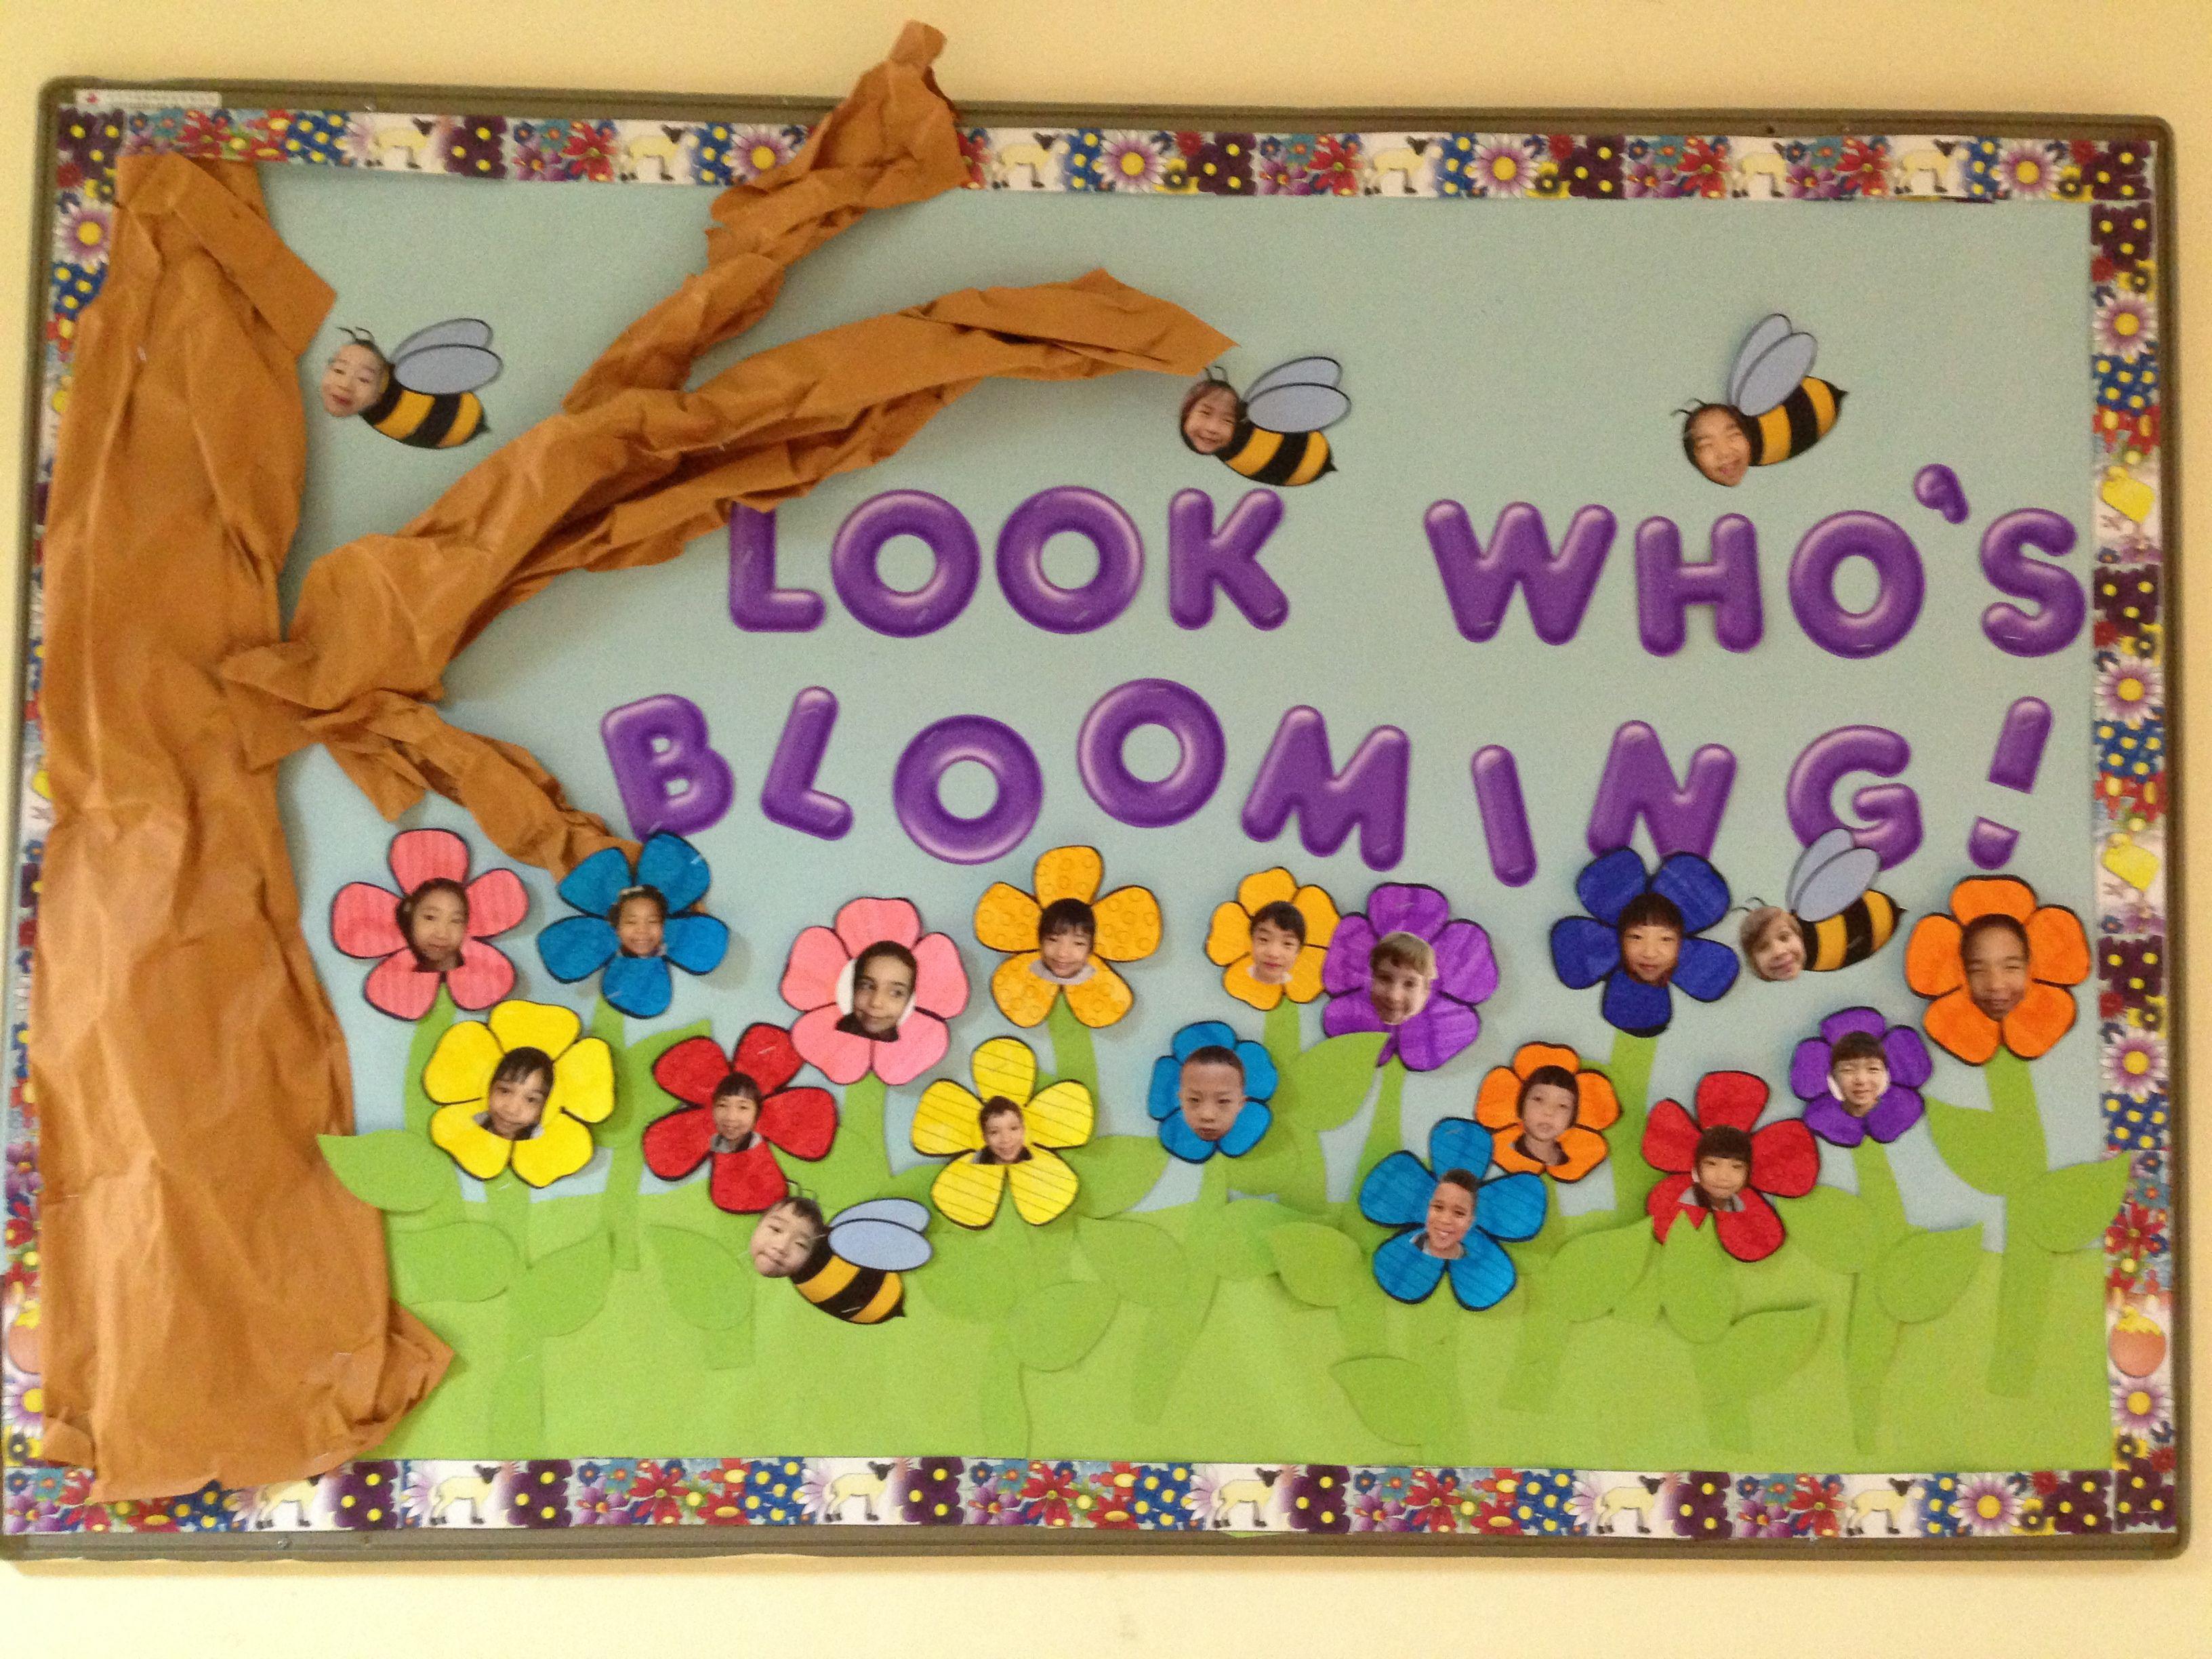 Pin By Zenaida Gorospe On Bulletin Boards Spring Bulletin Boards Preschool Spring Bulletin Boards Spring Bulletin